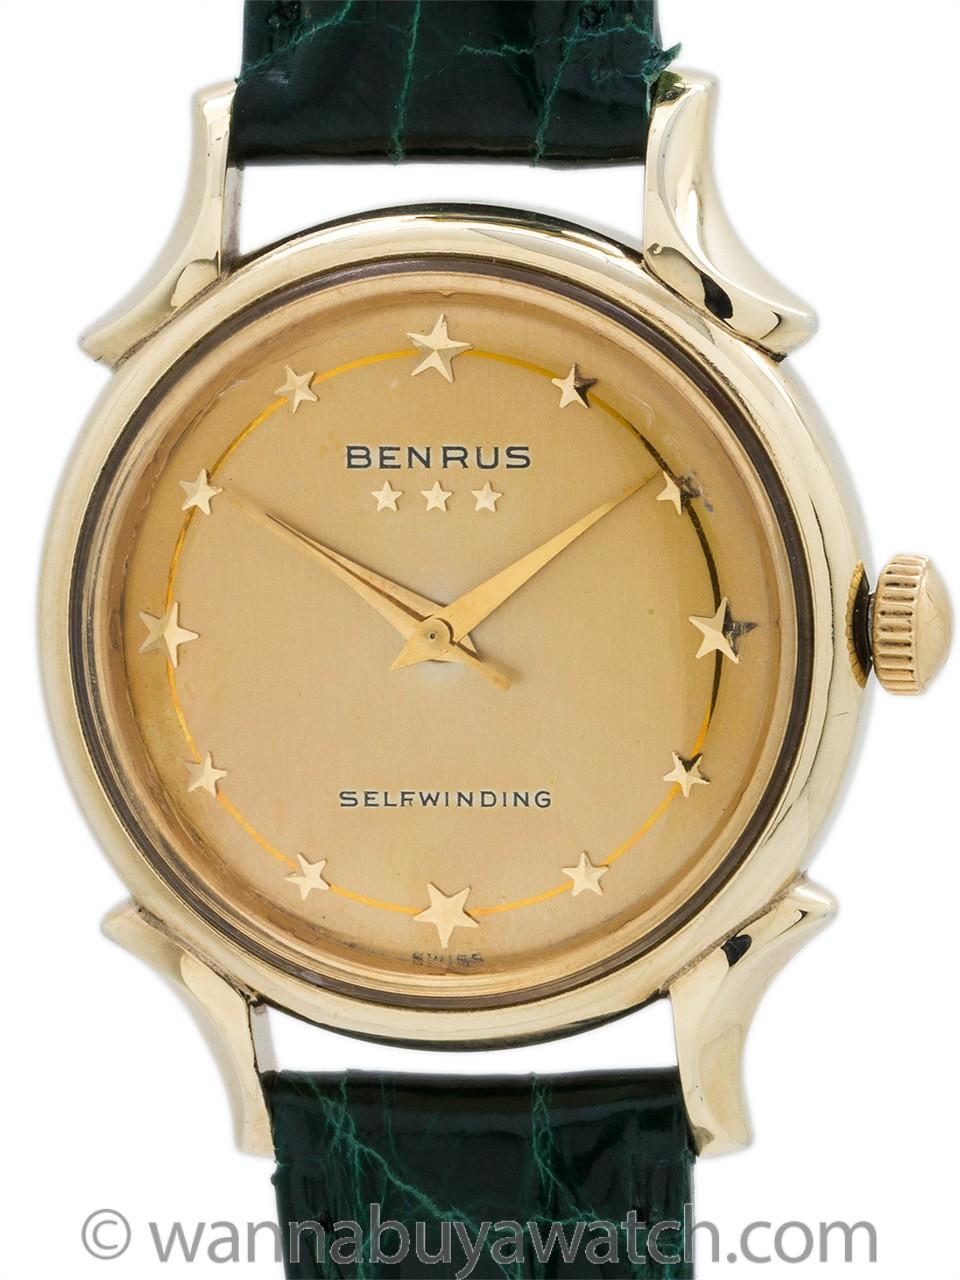 Benrus Star Dial Automatic circa 1959